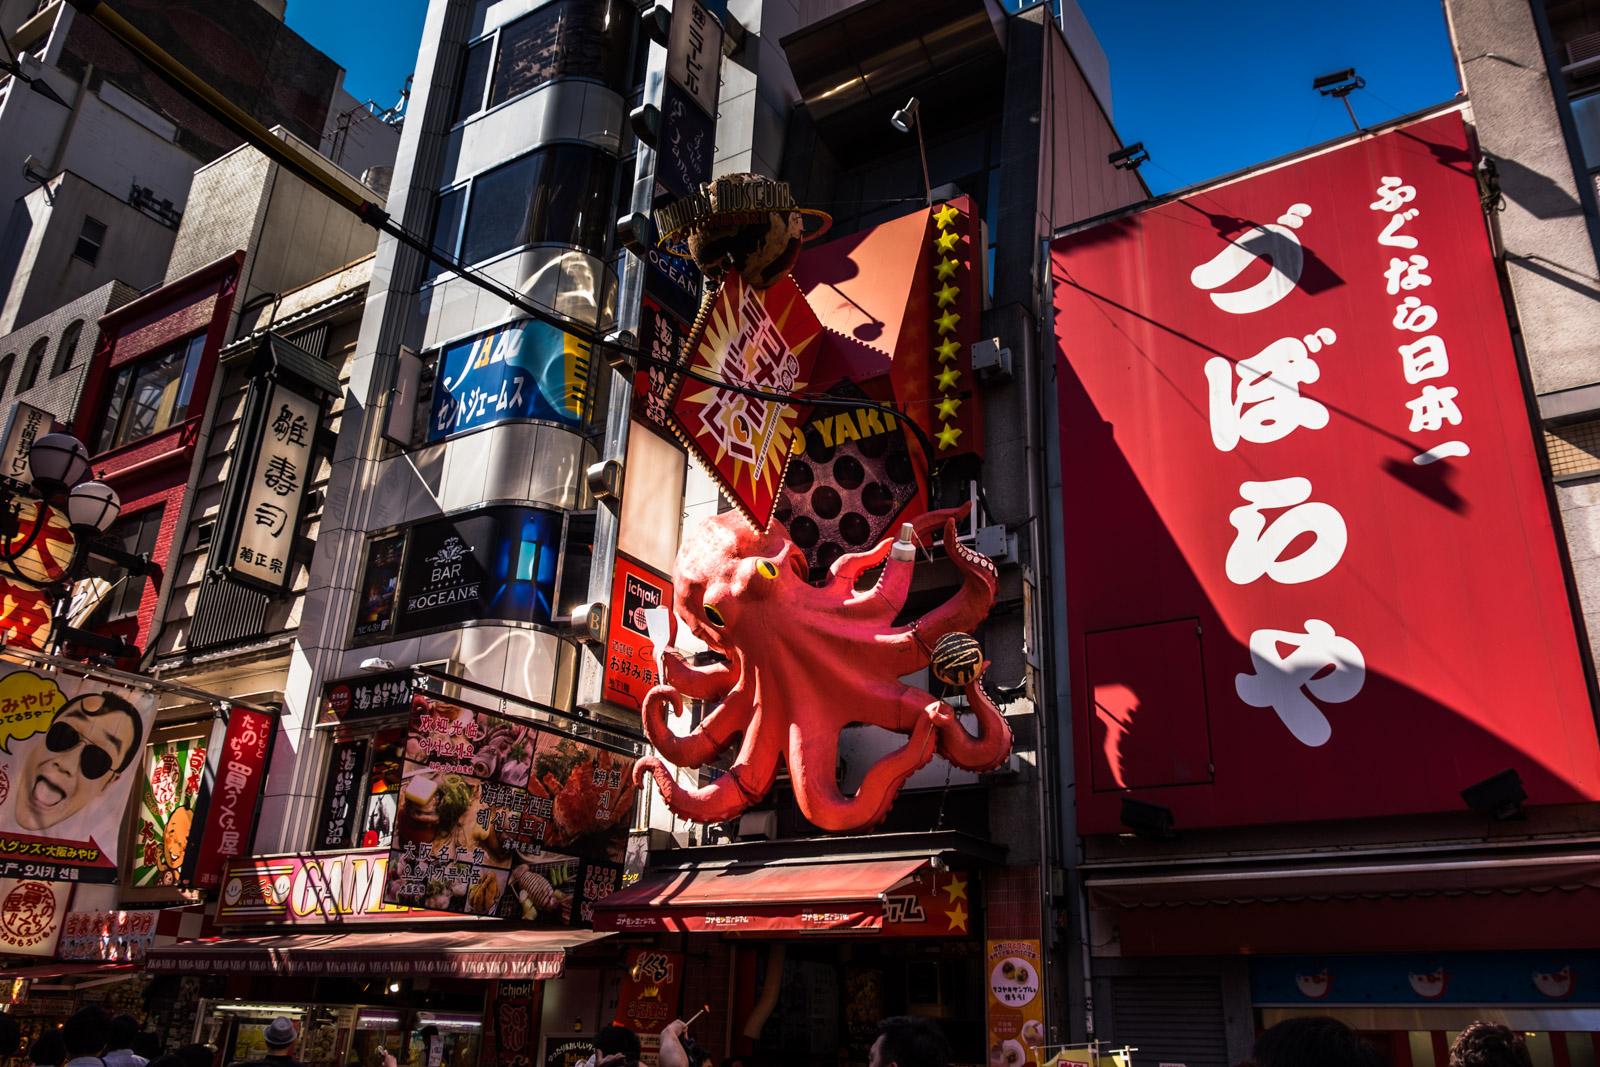 Street life in Osaka